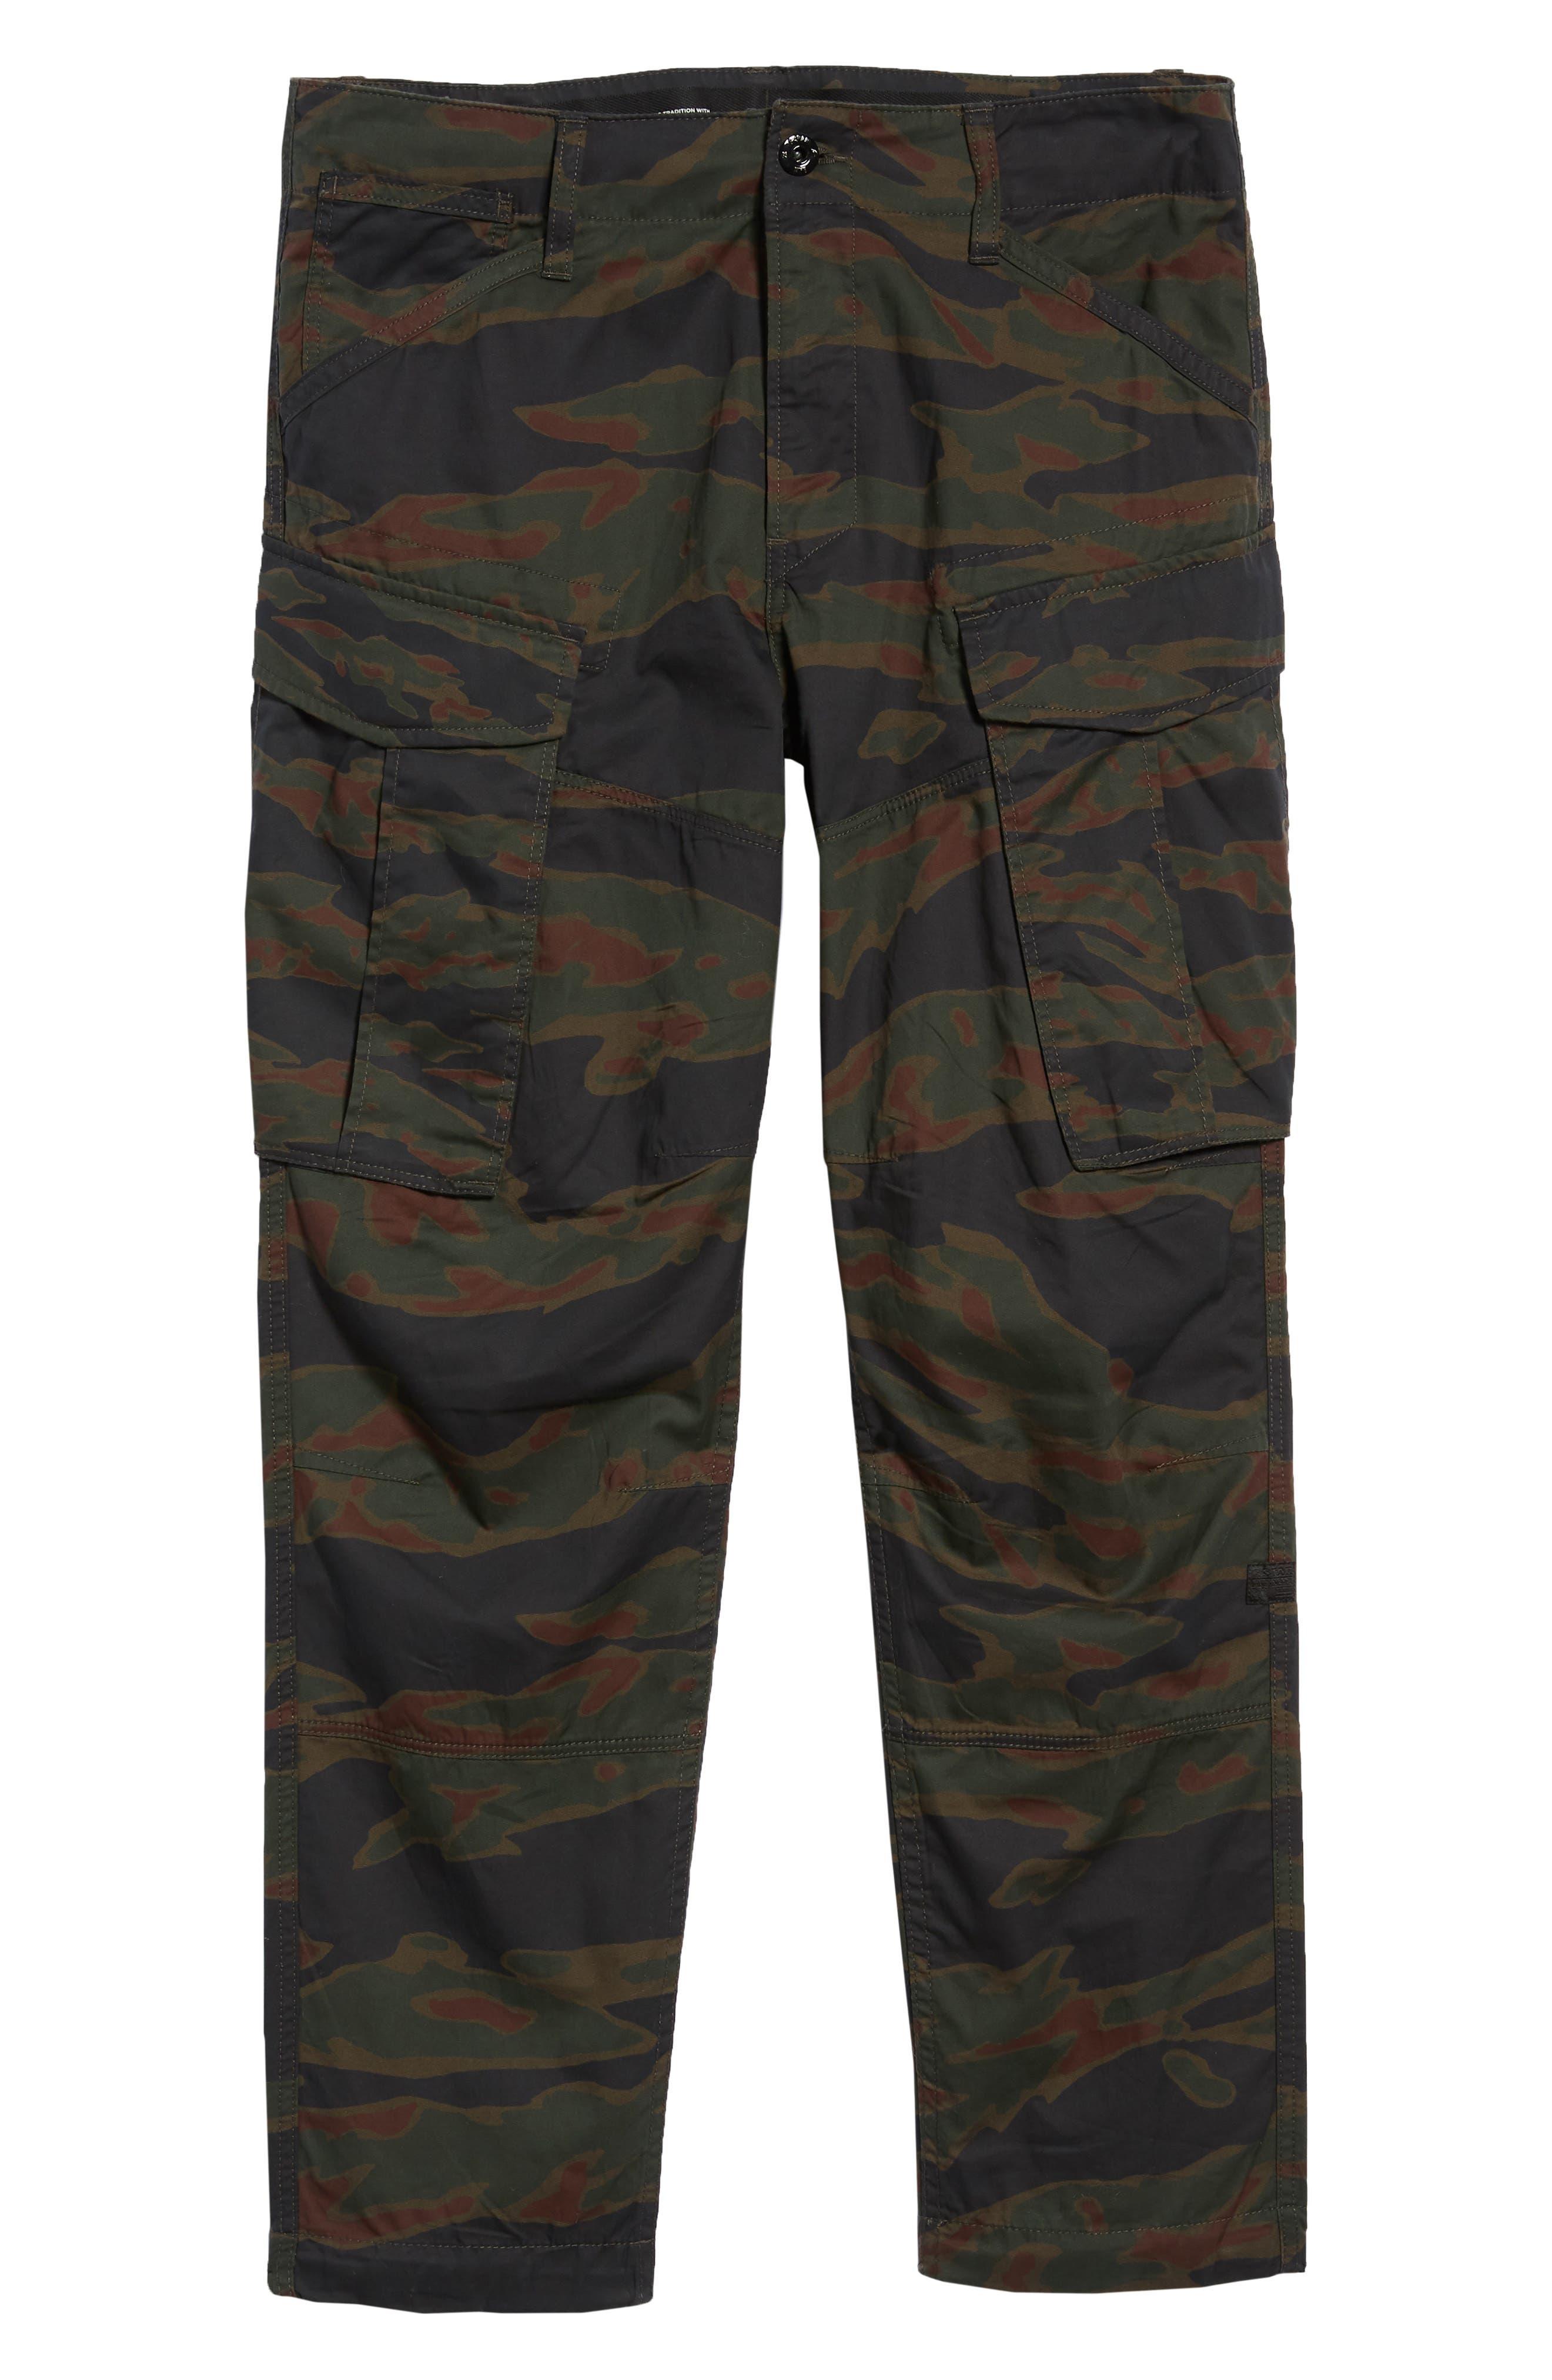 Rovic Tapered Cargo Pants,                             Alternate thumbnail 6, color,                             SMOKE GREEN/ DARK VERMO